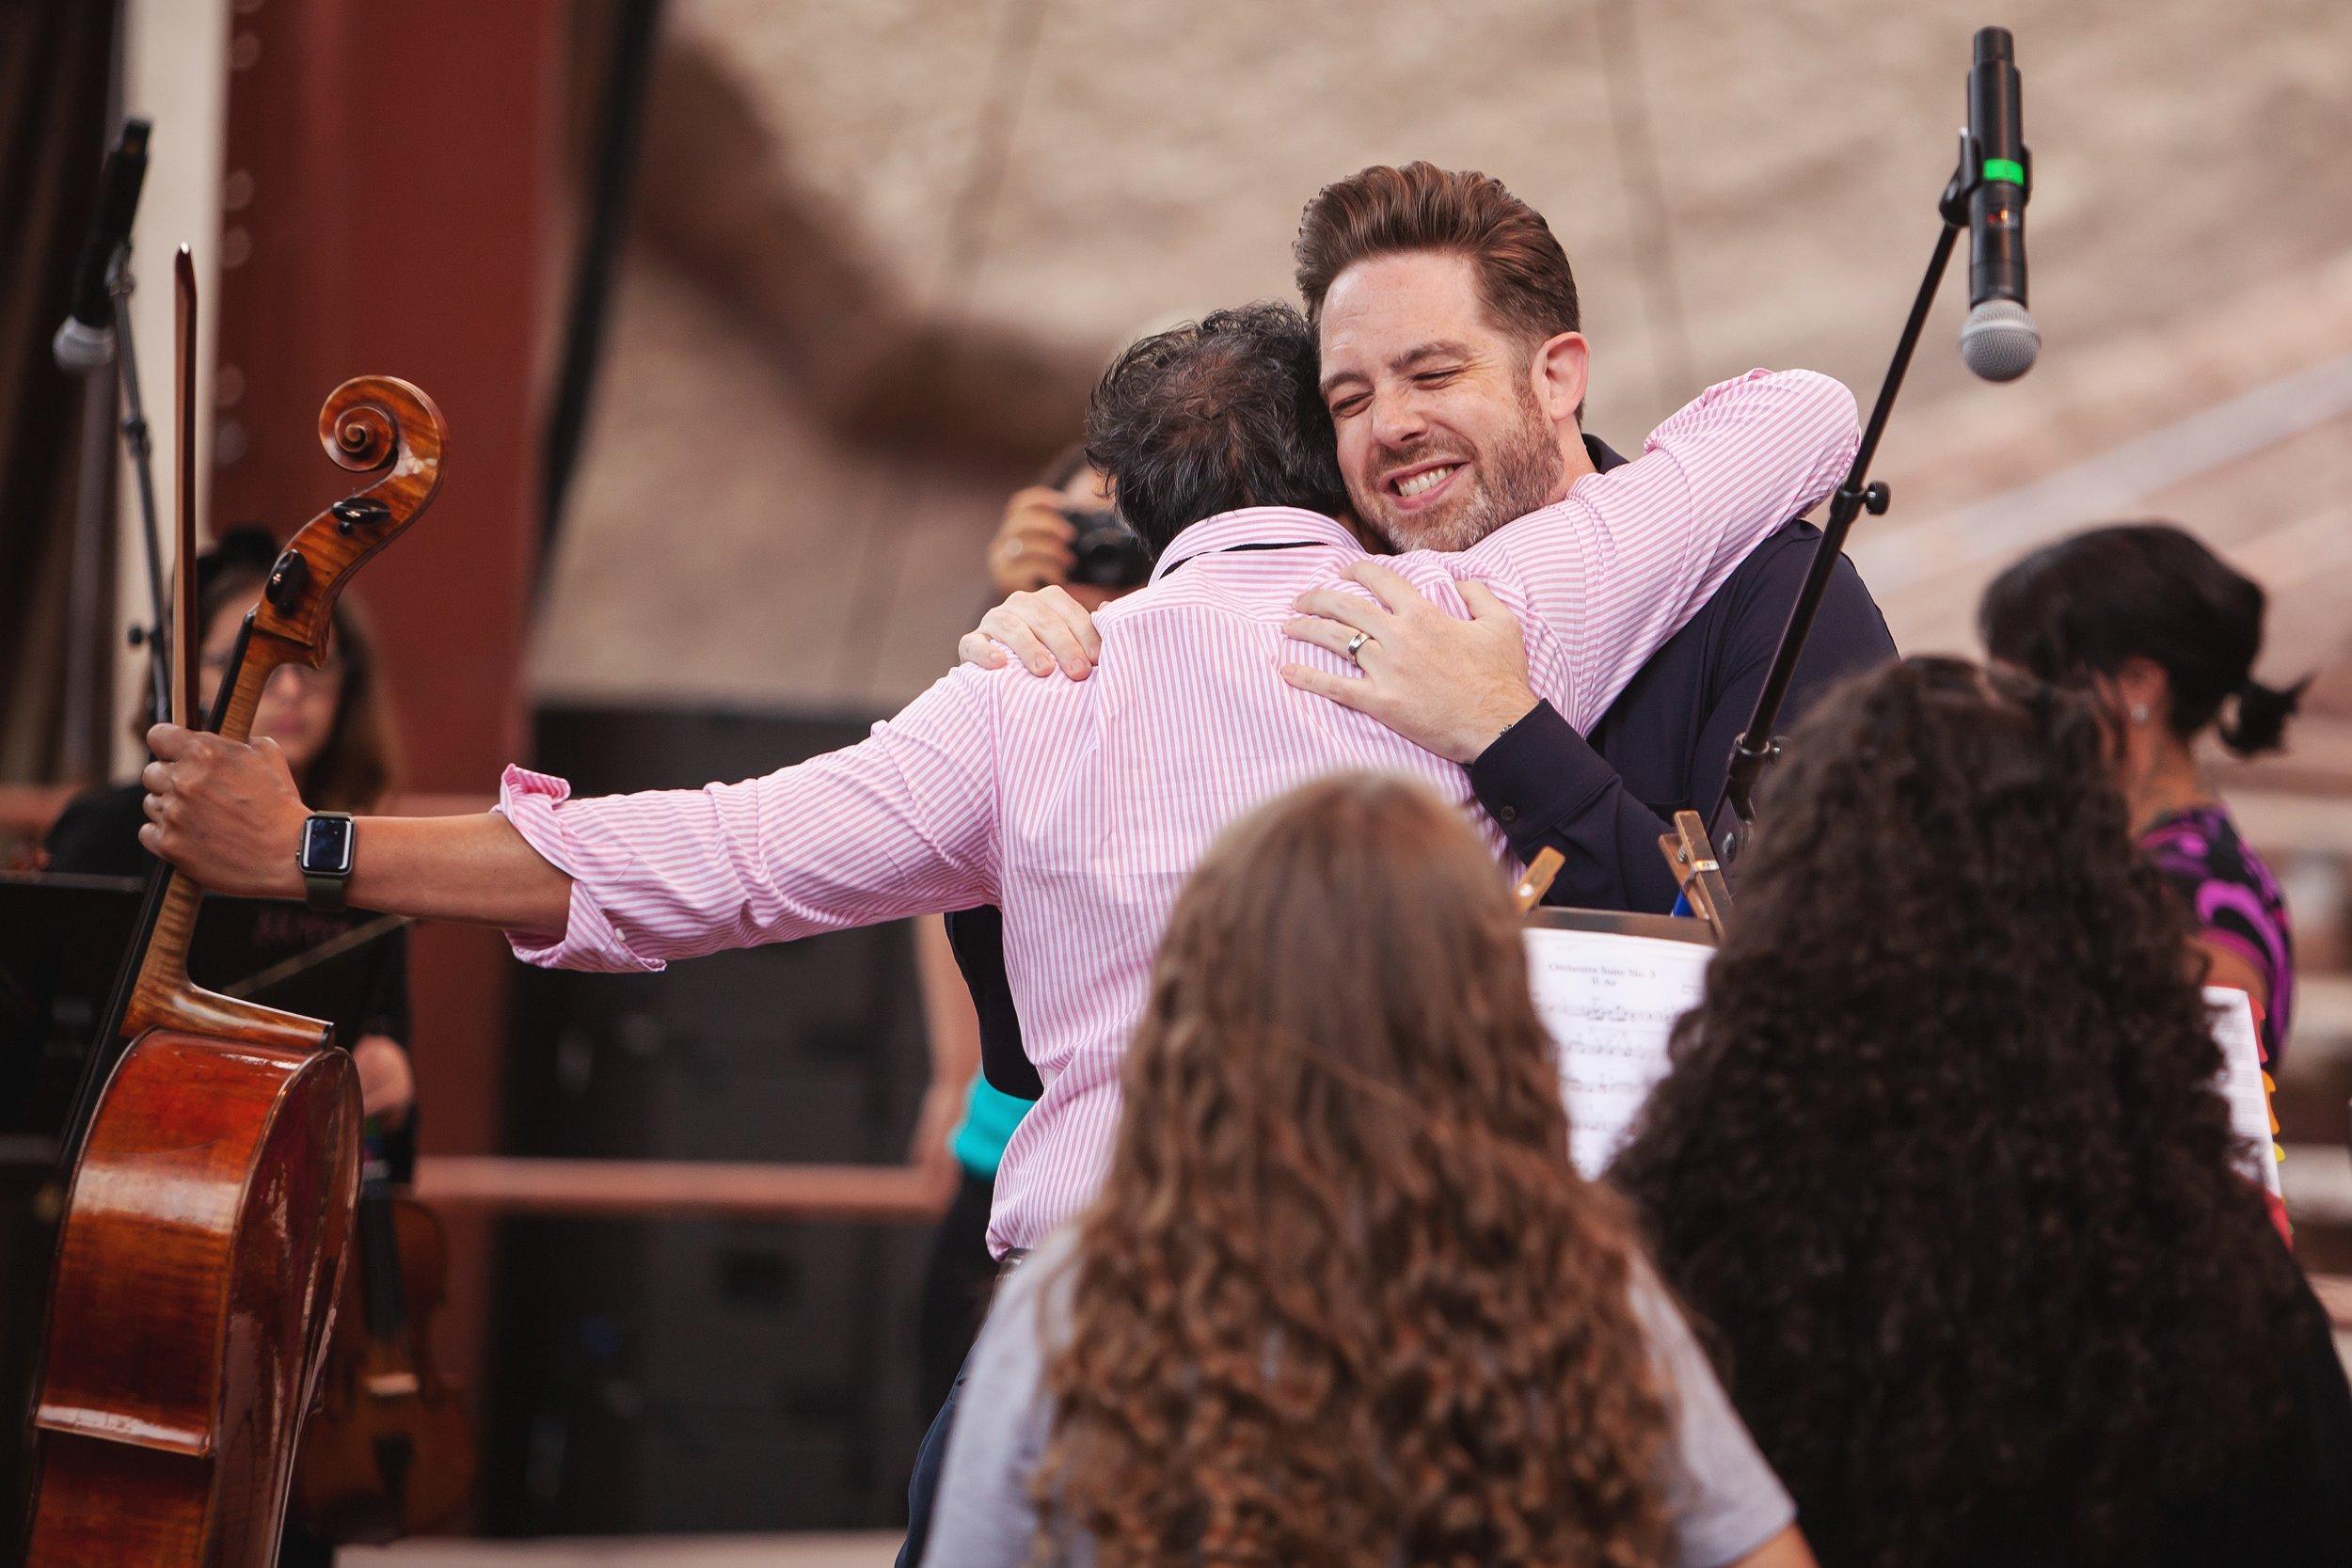 Brett Mitchell greets Yo-Yo Ma at Red Rocks Amphitheater in Morrison, CO. (Photo by Amanda Tipton)